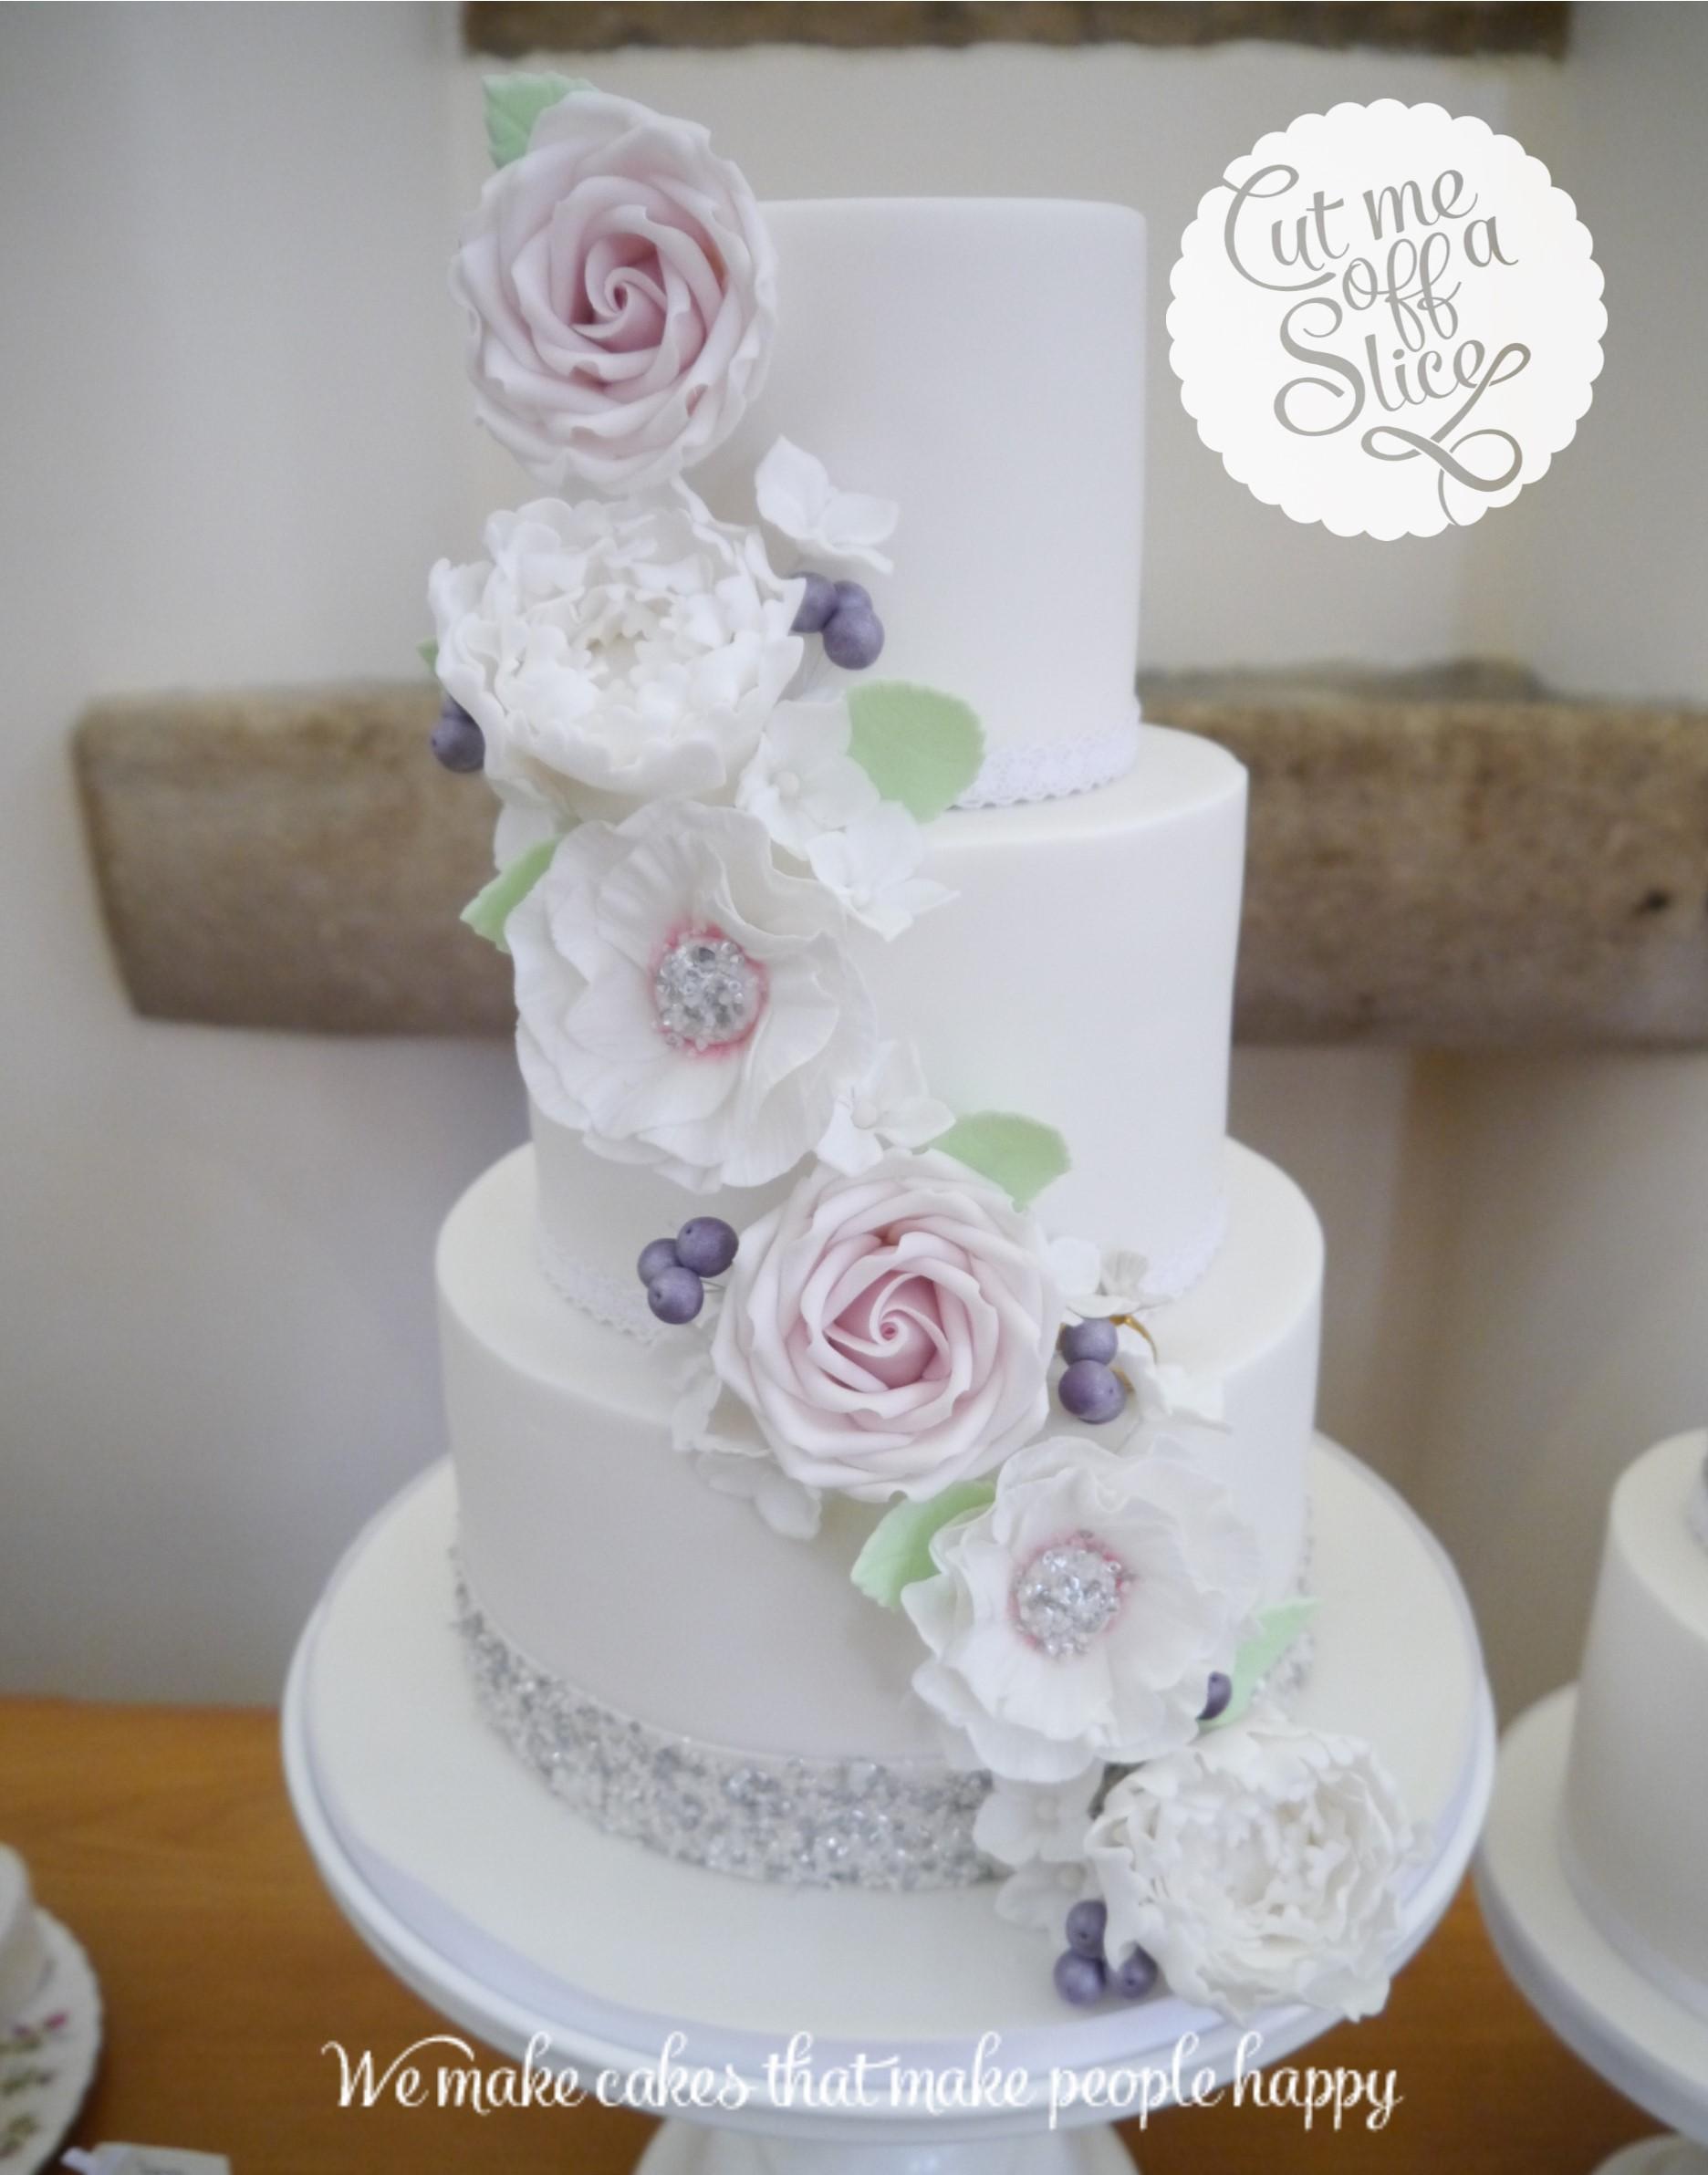 Contemporary Cut Wedding Cake Frieze - Wedding Idea 2018 ...